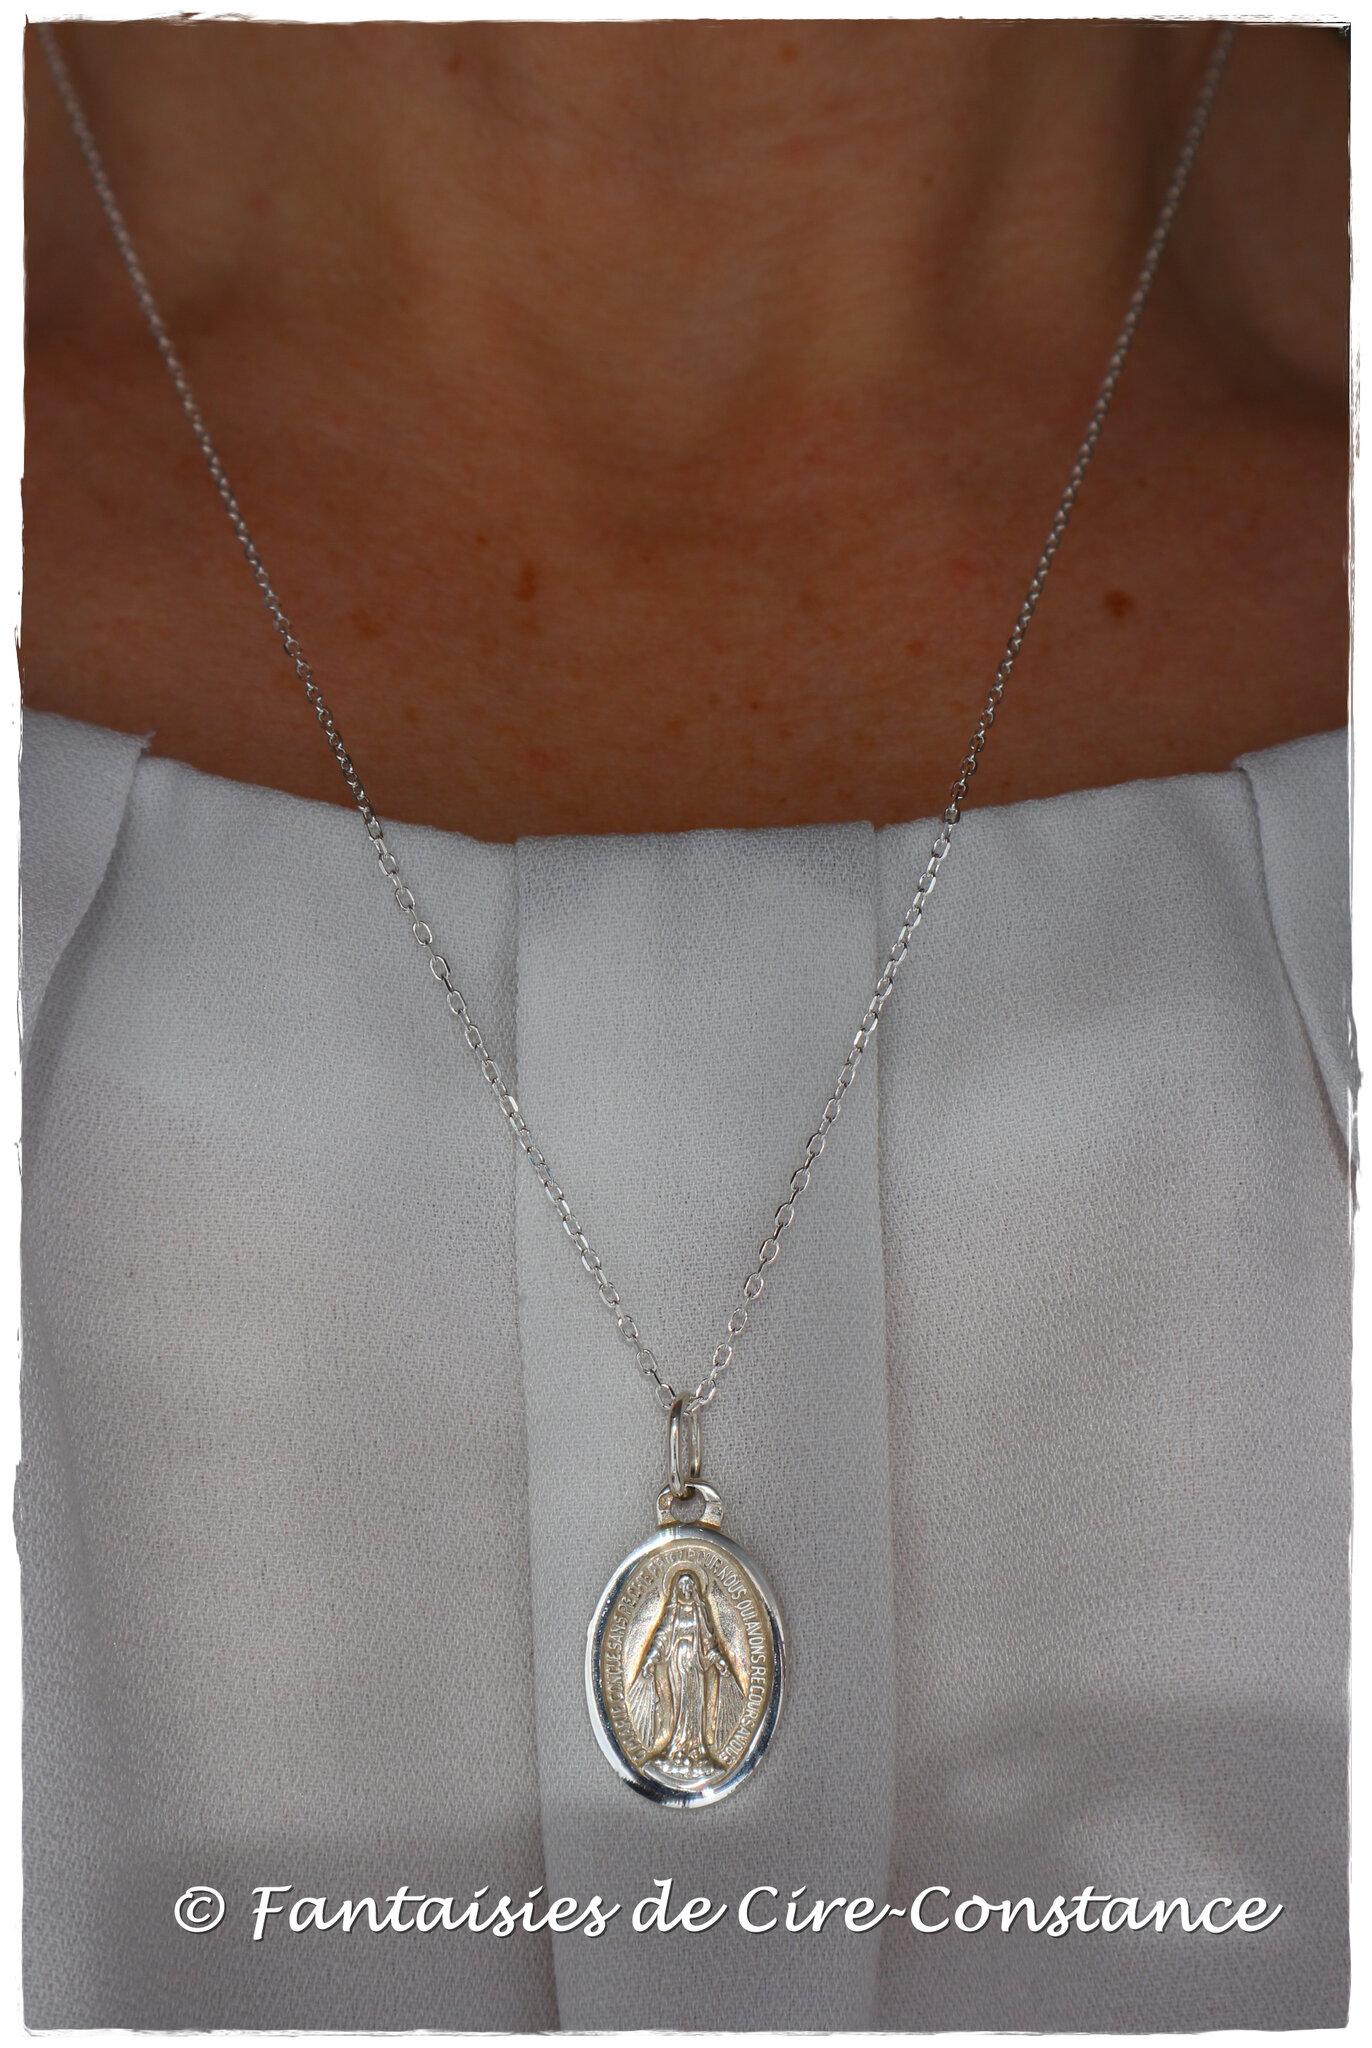 Collier médaille miraculeuse 20 mm argent massif